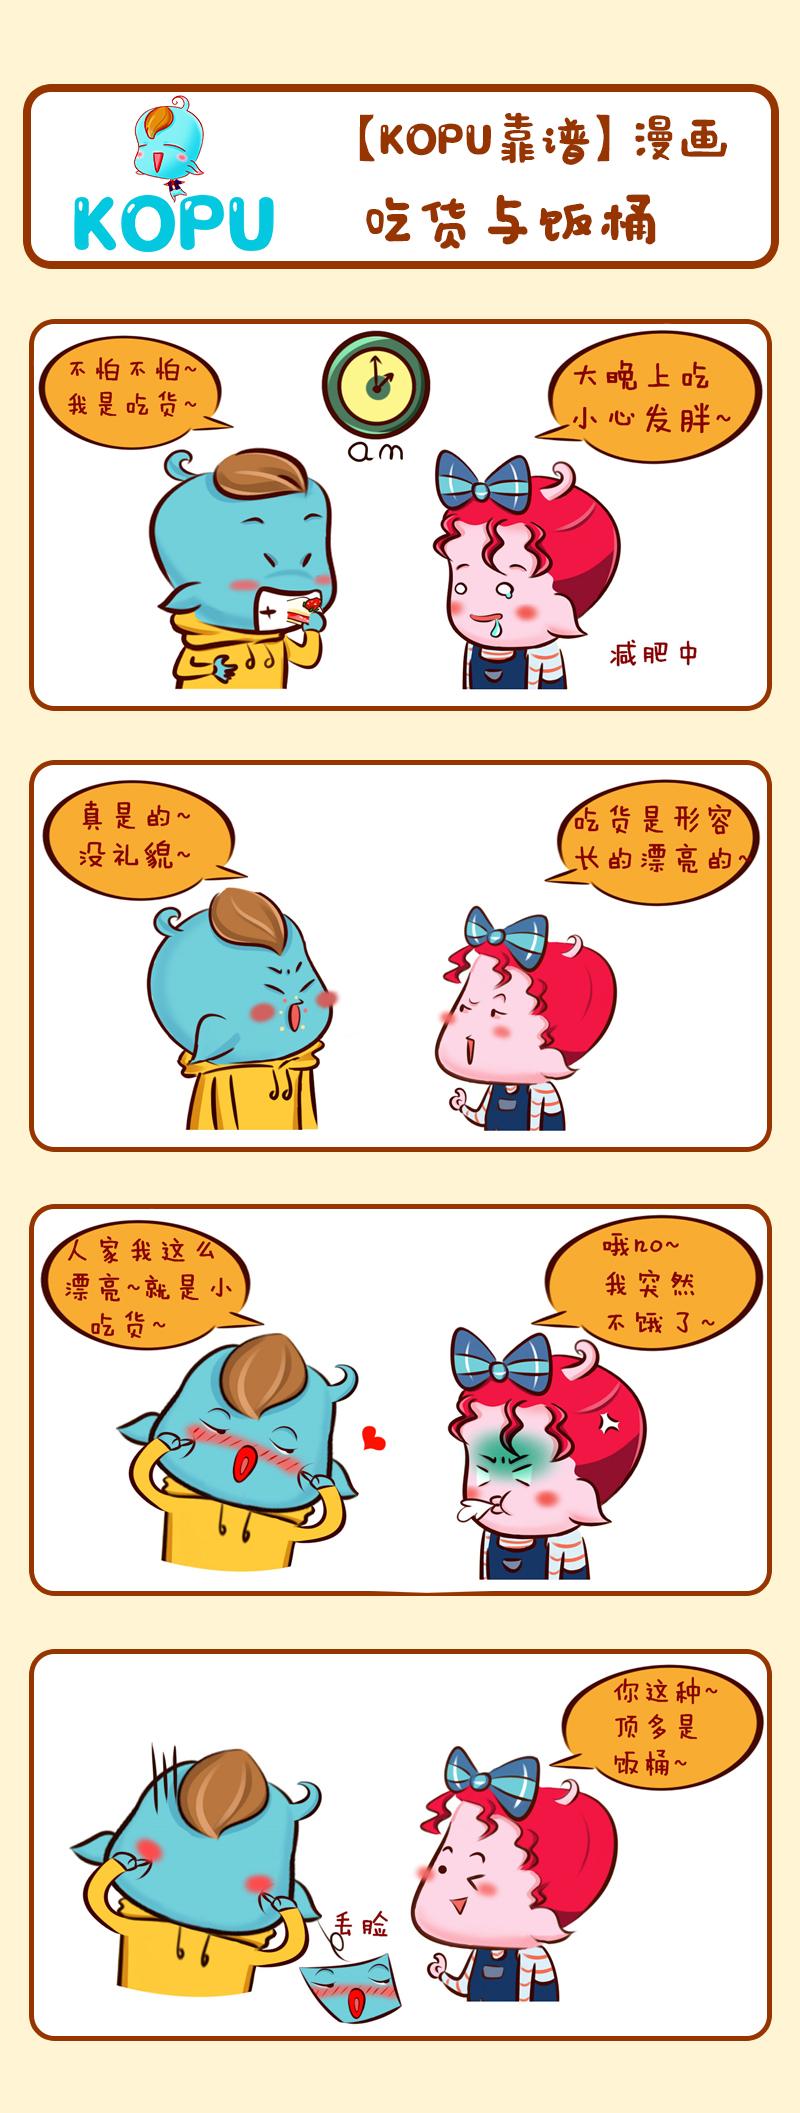 【kopu靠谱】吃货与饭桶|短篇/四格漫画|动漫|kopu的